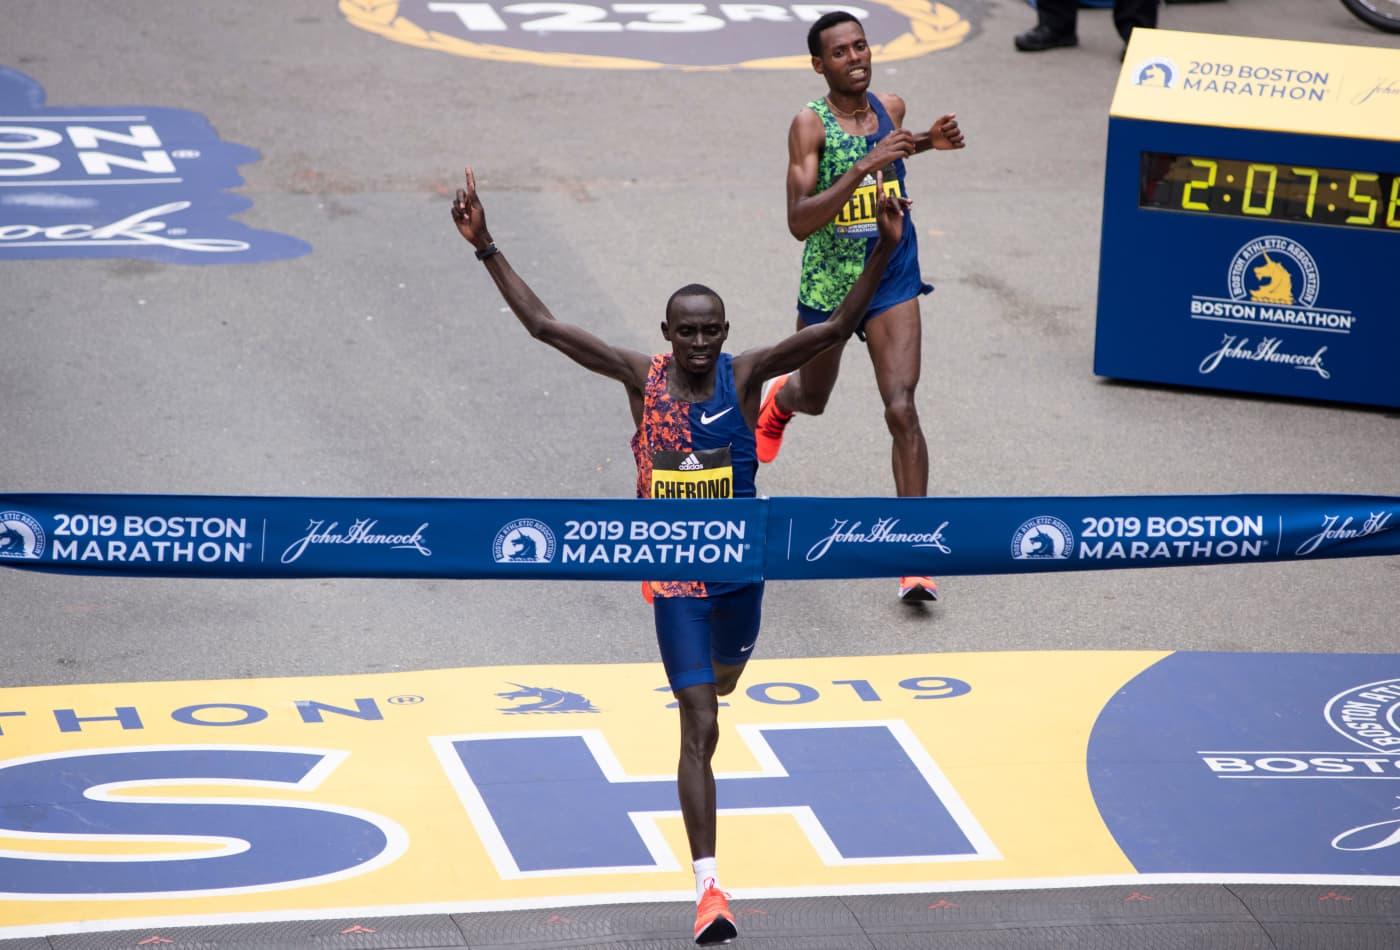 f87744761c3 Here s how much money the Boston Marathon champions earn